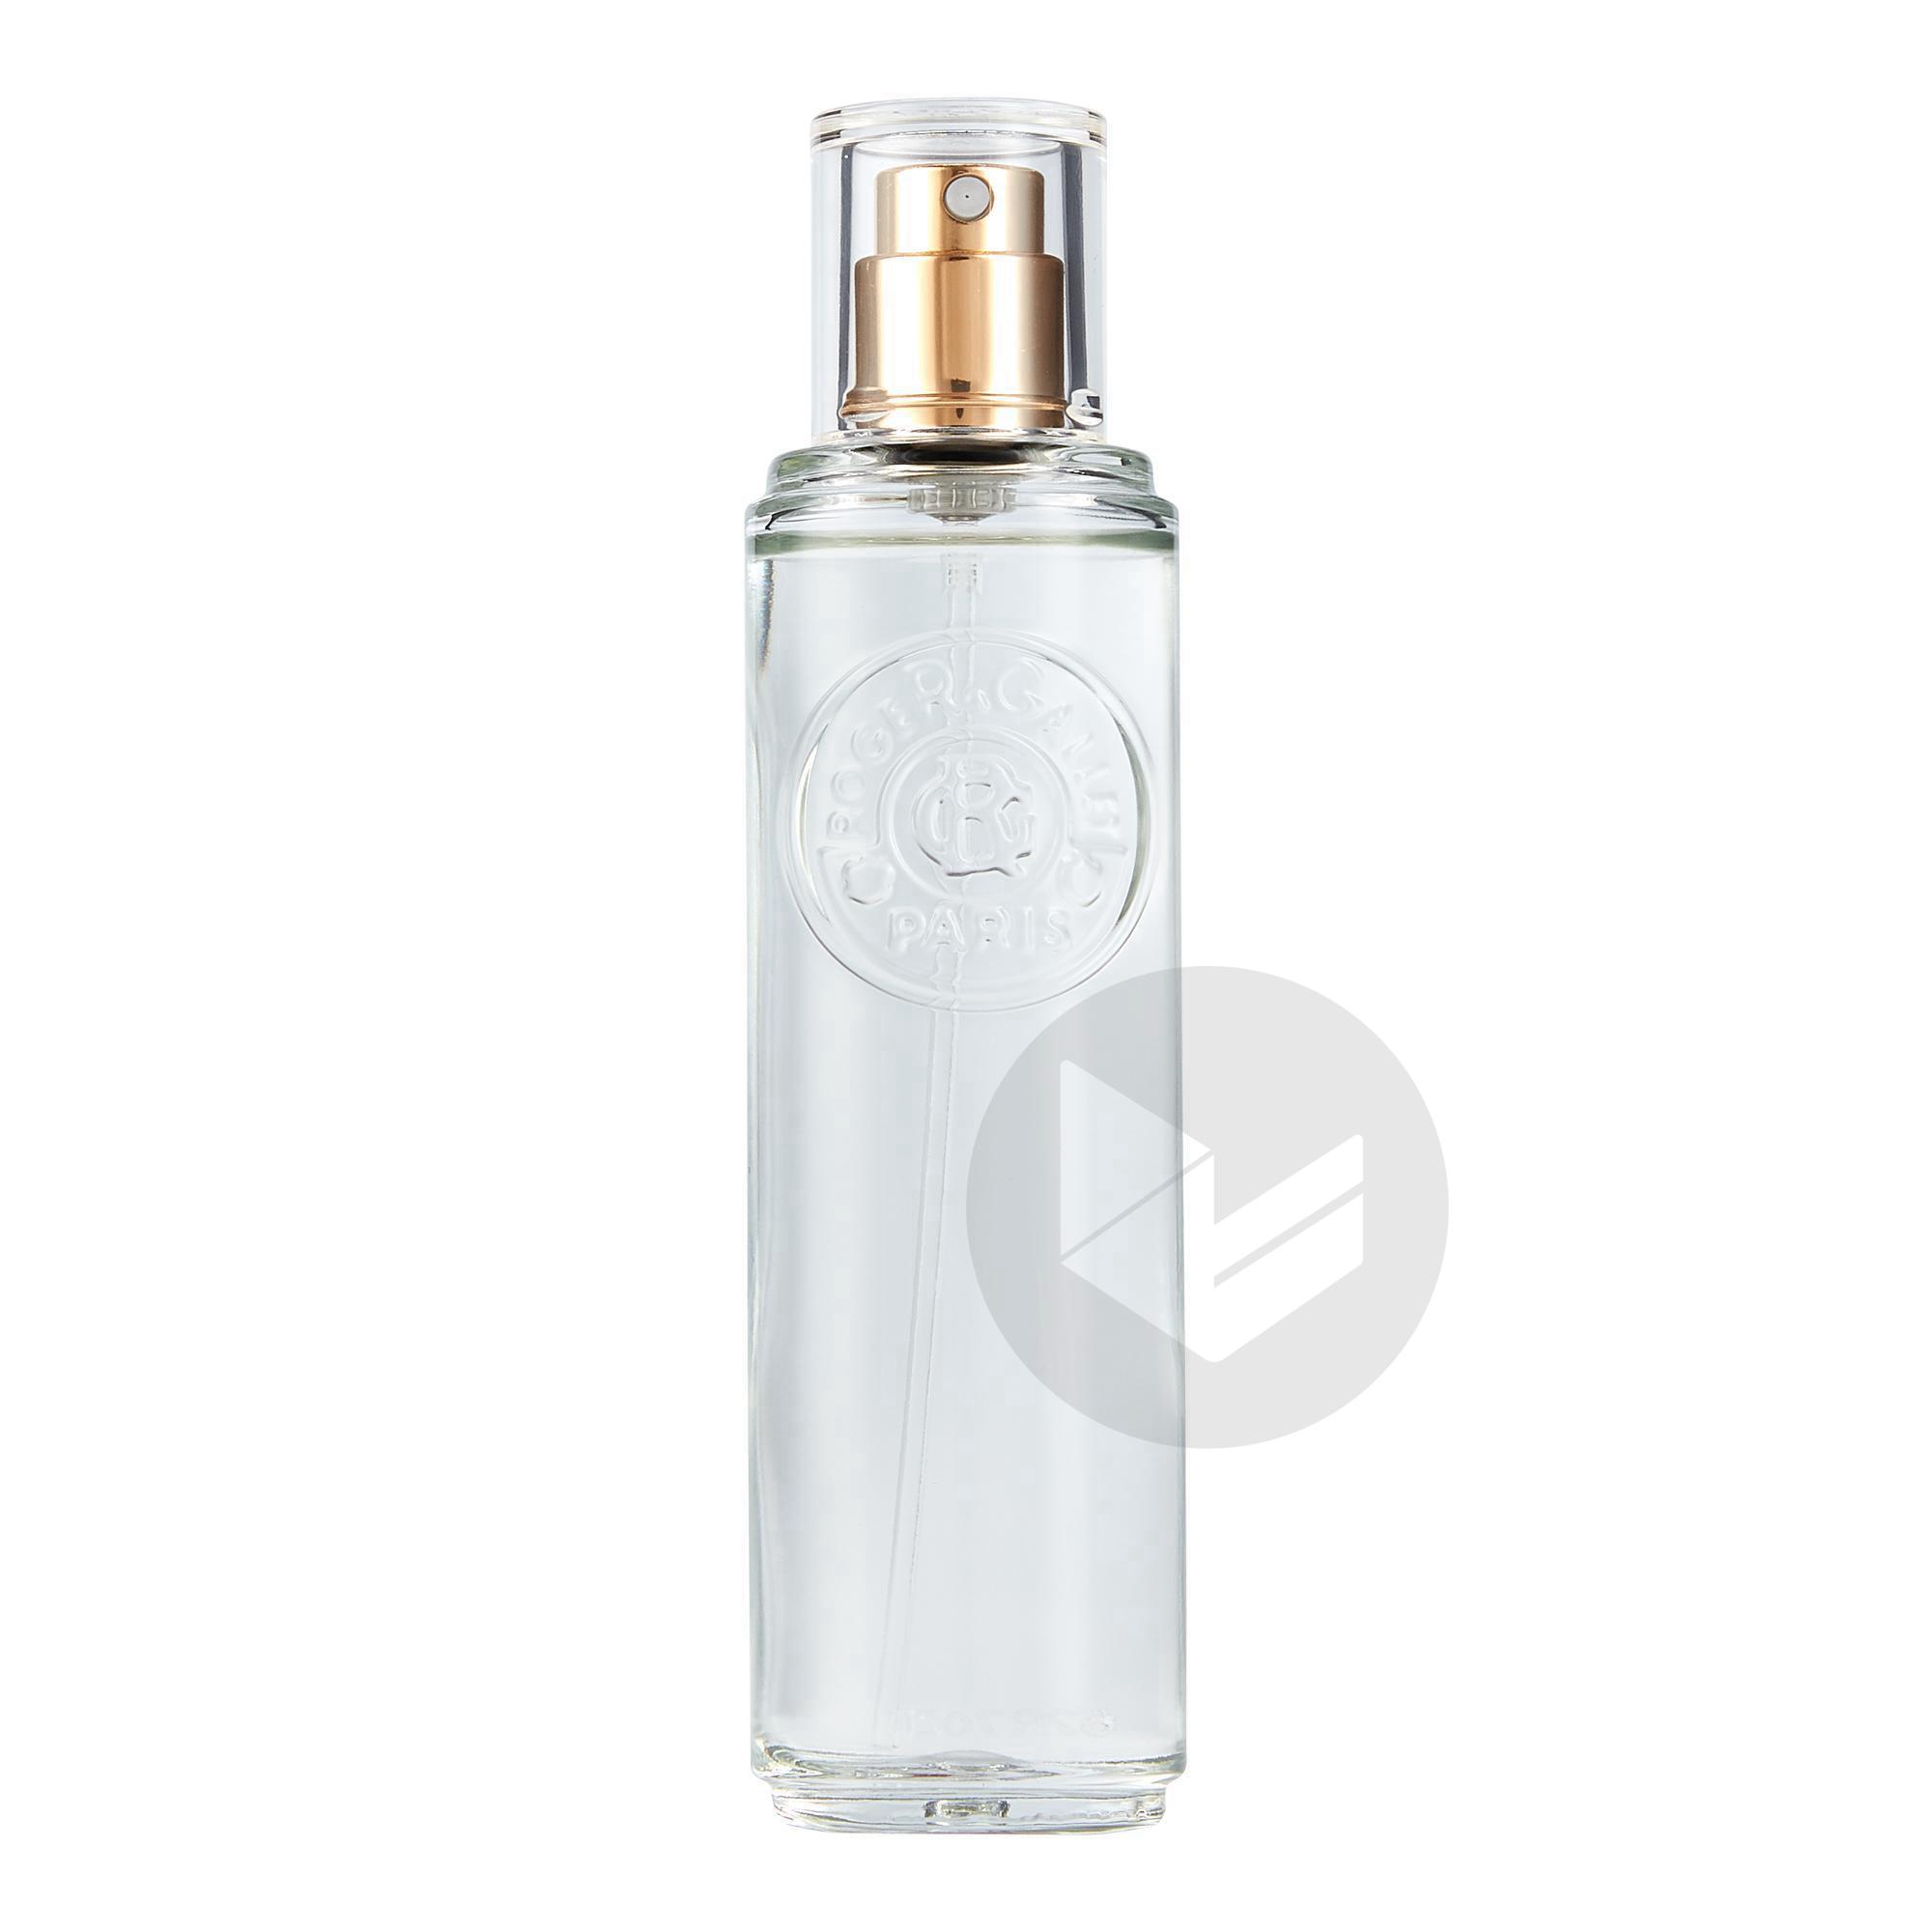 Rose Eau Fraiche Parfumee Bienfaisante Vaporisateur 30 Ml